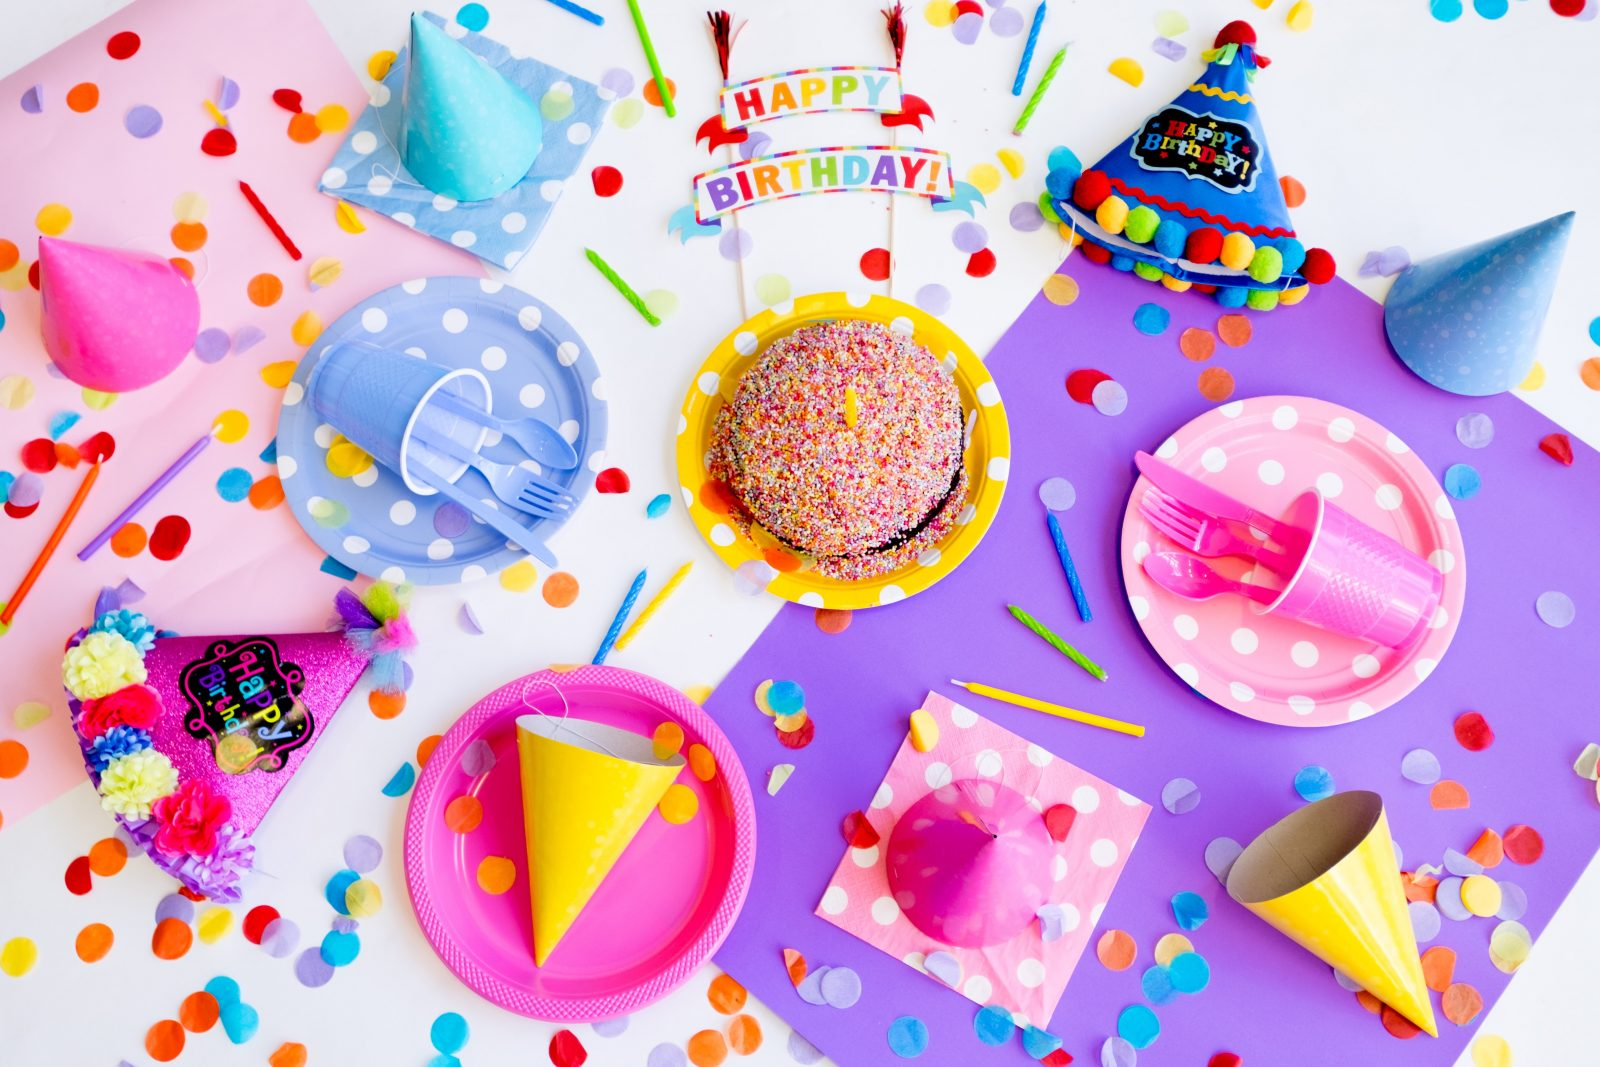 merienda de cumpleaños